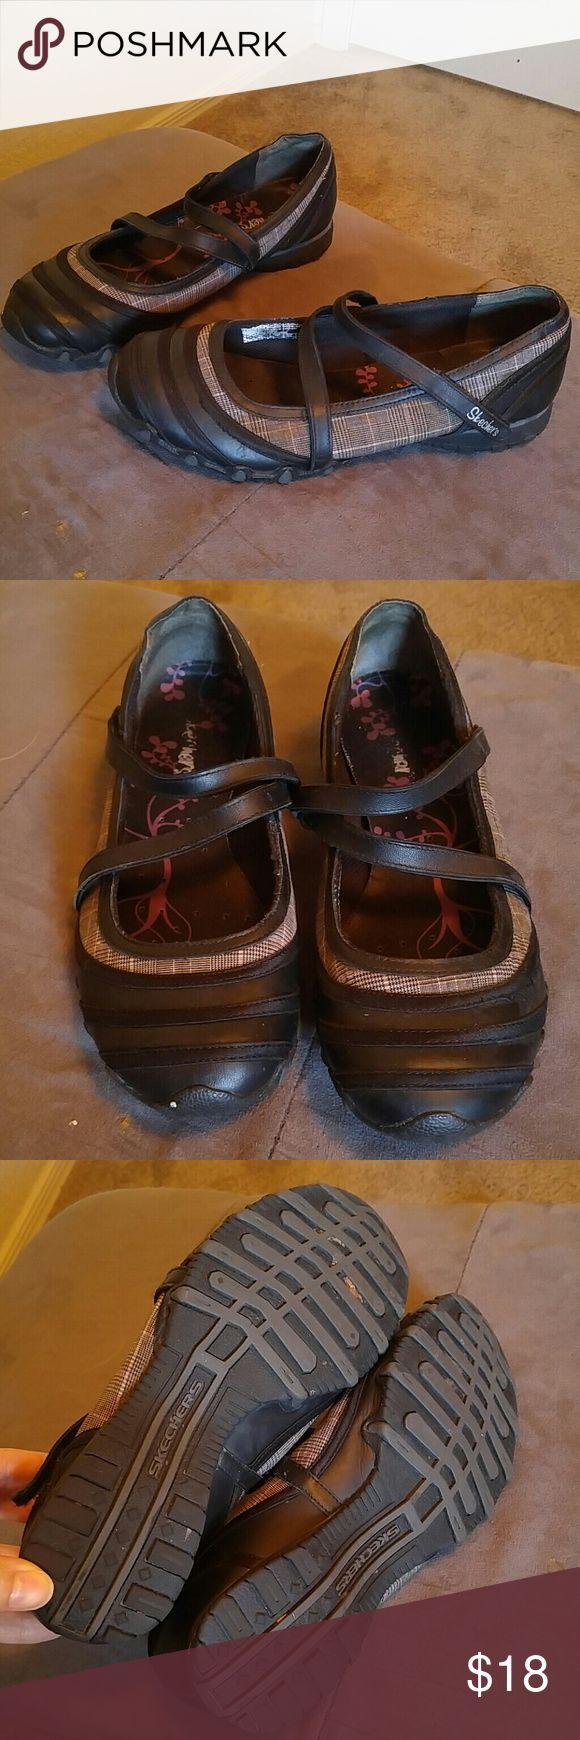 Skechers Mary Jane Flats sz 8 Skechers Mary Jane flats sz 8. Skechers Shoes Flats & Loafers